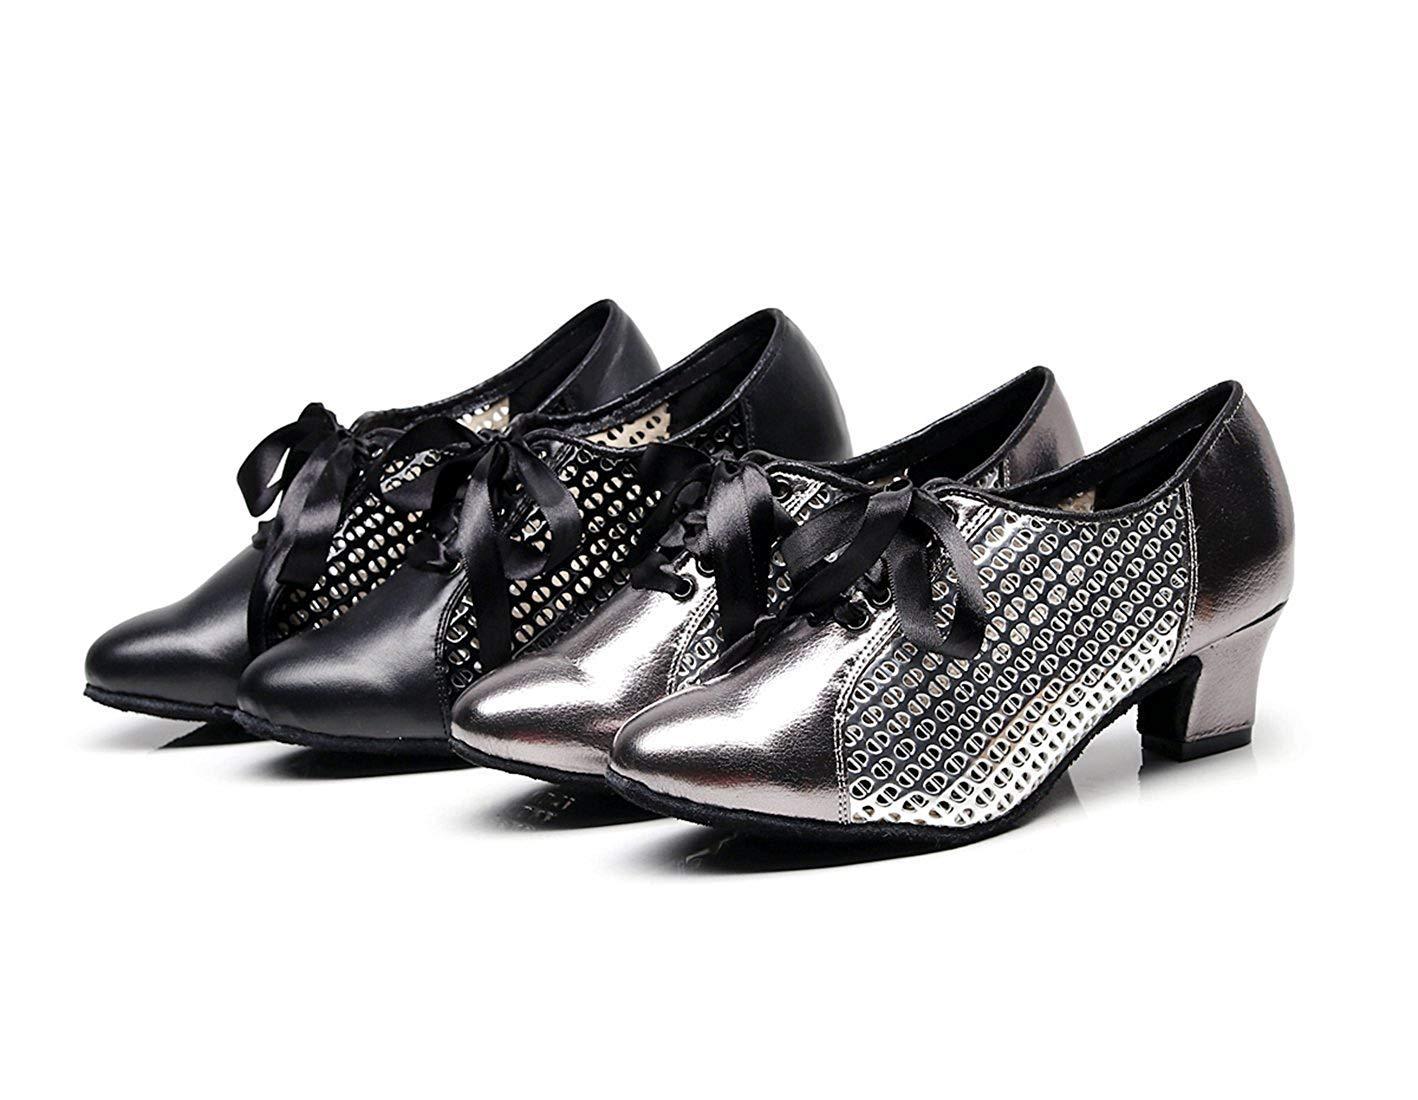 Qiusa Damen Mesh Lace-up Grau Synthetische Chunky Low Heel Latin Latin Latin Ballroom Tanzen Pumps Abendschuhe UK 4 (Farbe   - Größe   -) 87b768